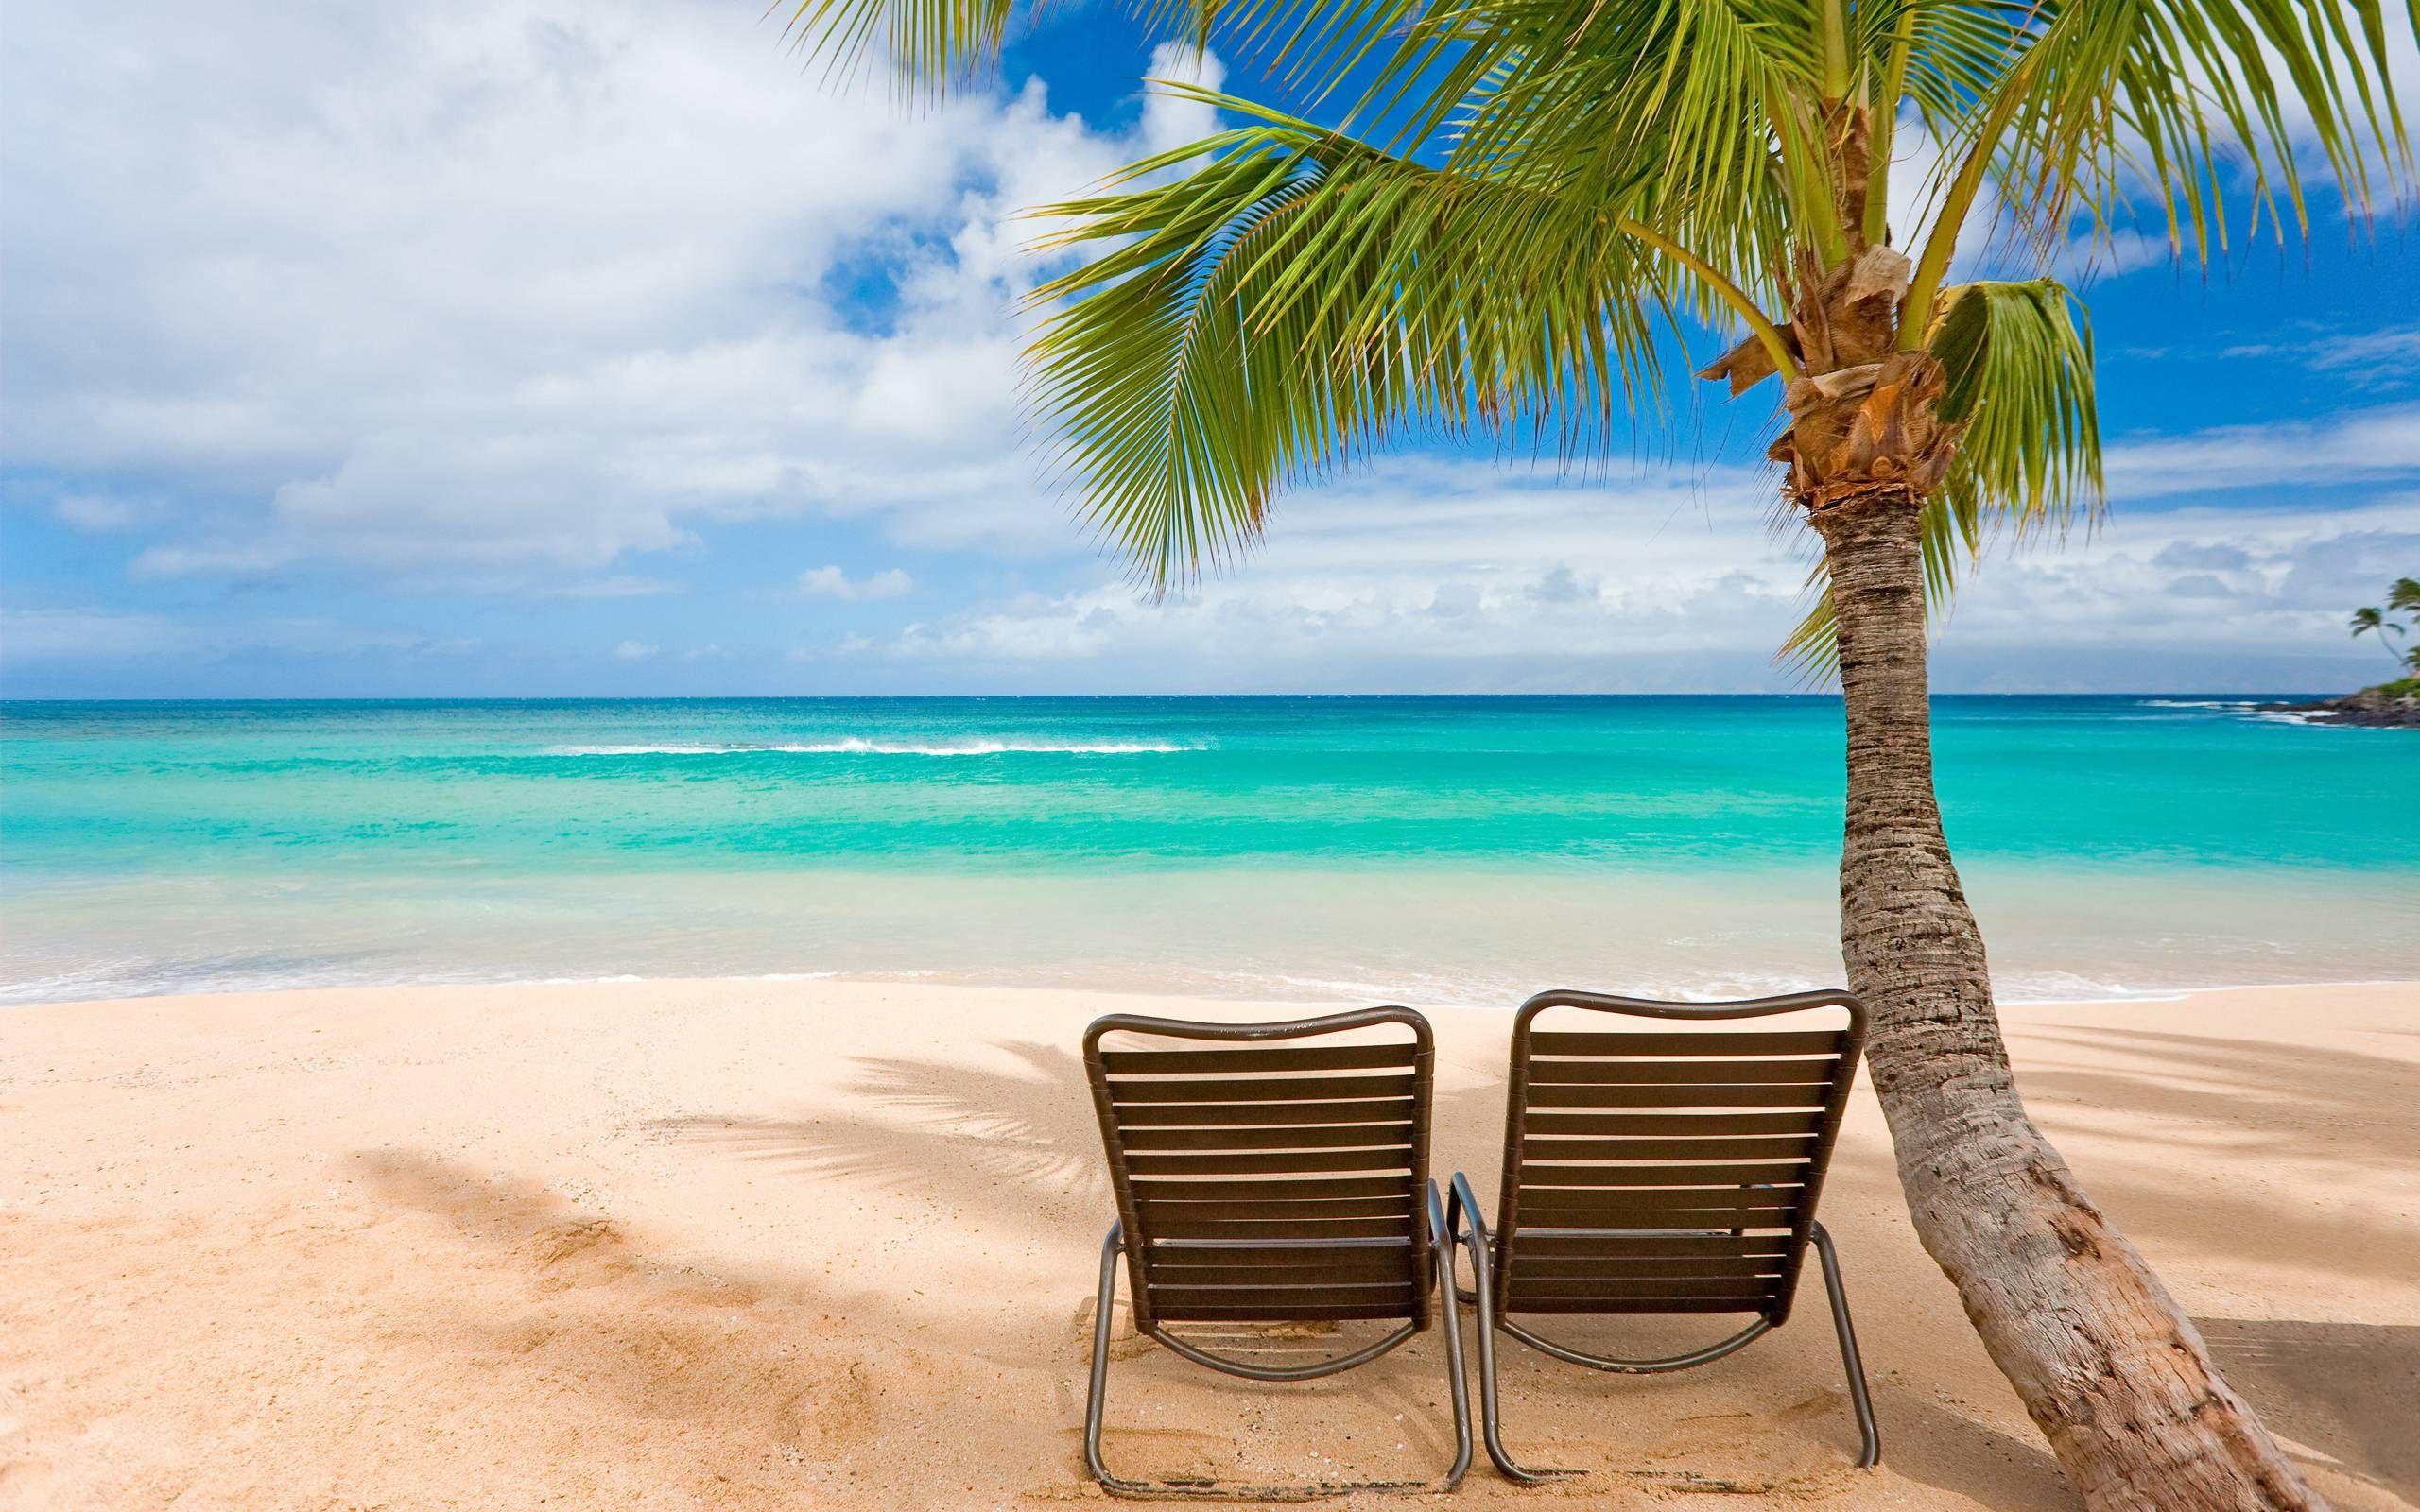 High Definition Tropical Wallpapers Летние обои, Пляжные